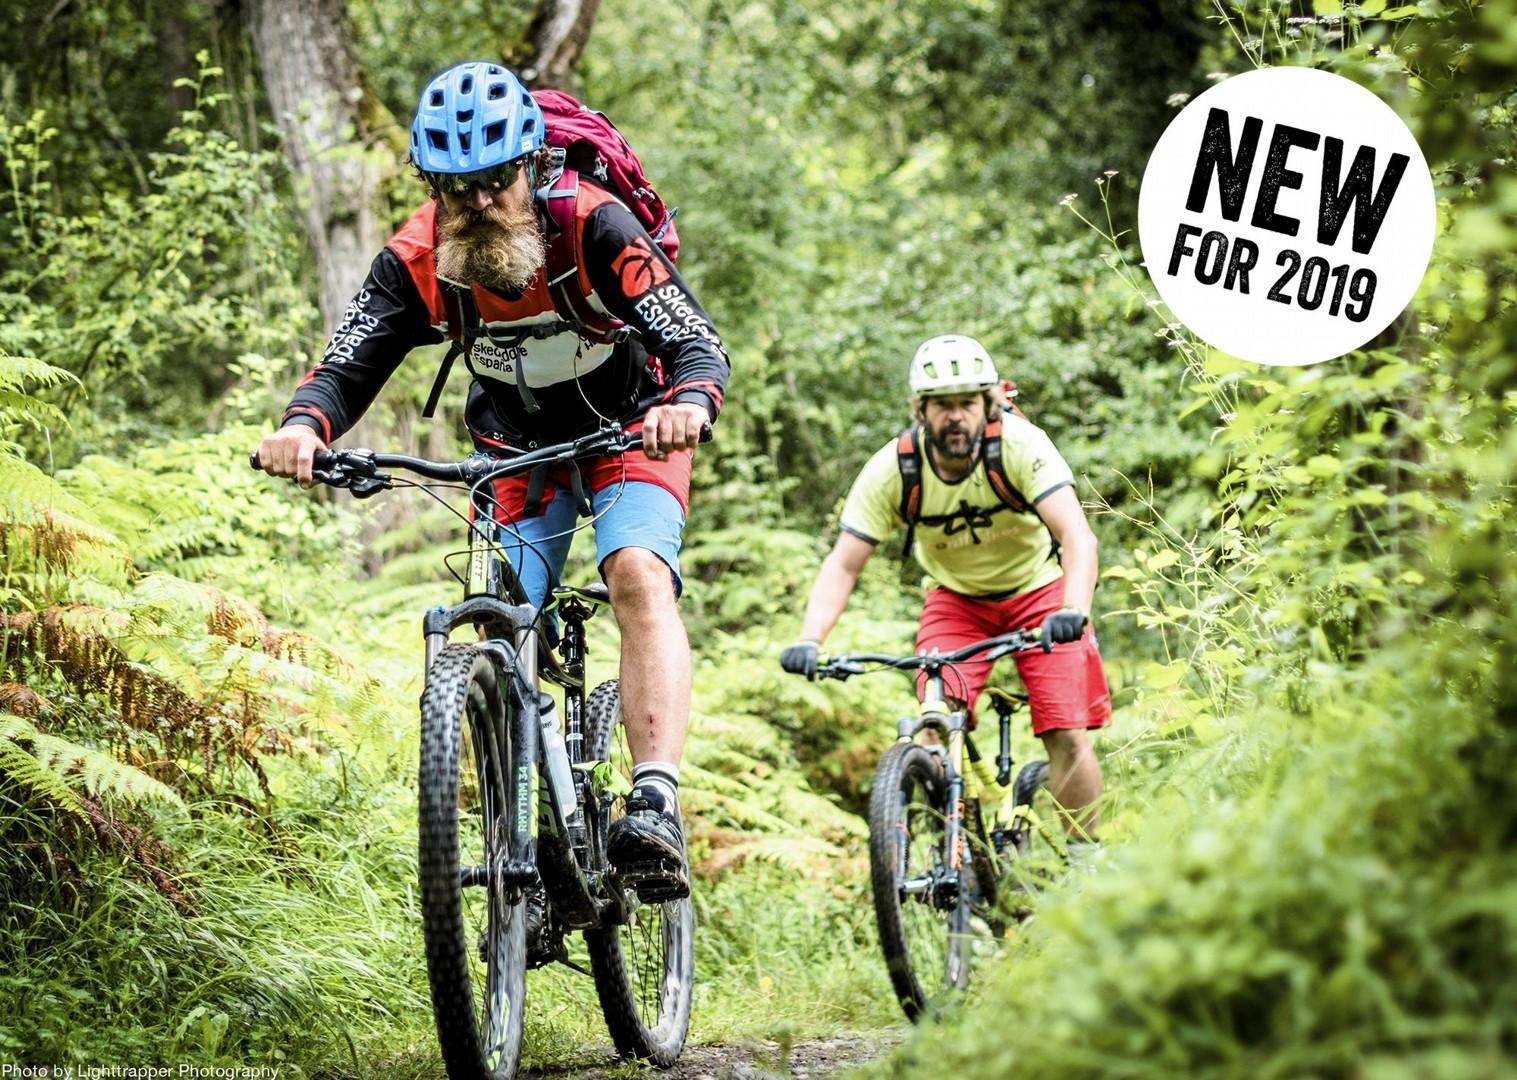 guided-mountain-biking-holiday-spain-camino-primitivo.jpg - NEW! Spain - Camino Primitivo - Mountain Biking